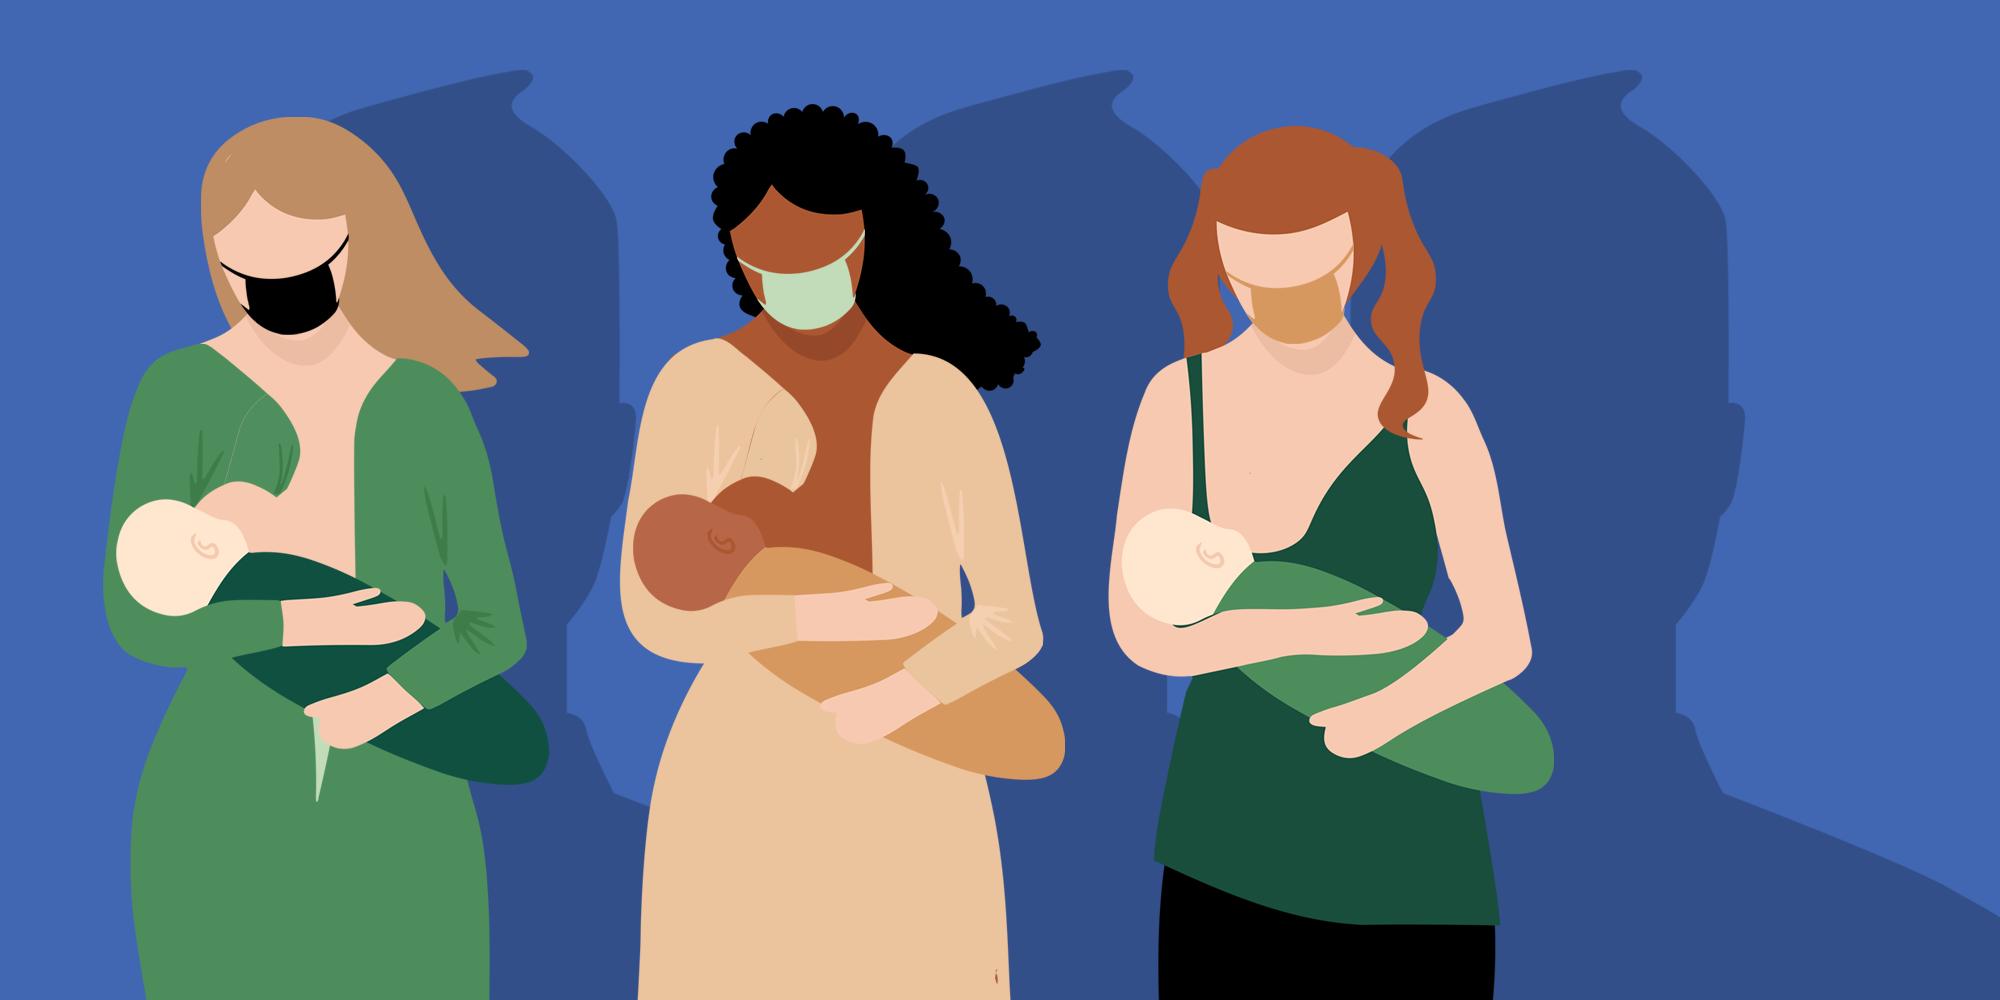 three women breastfeeding with facebook head logo for shadows